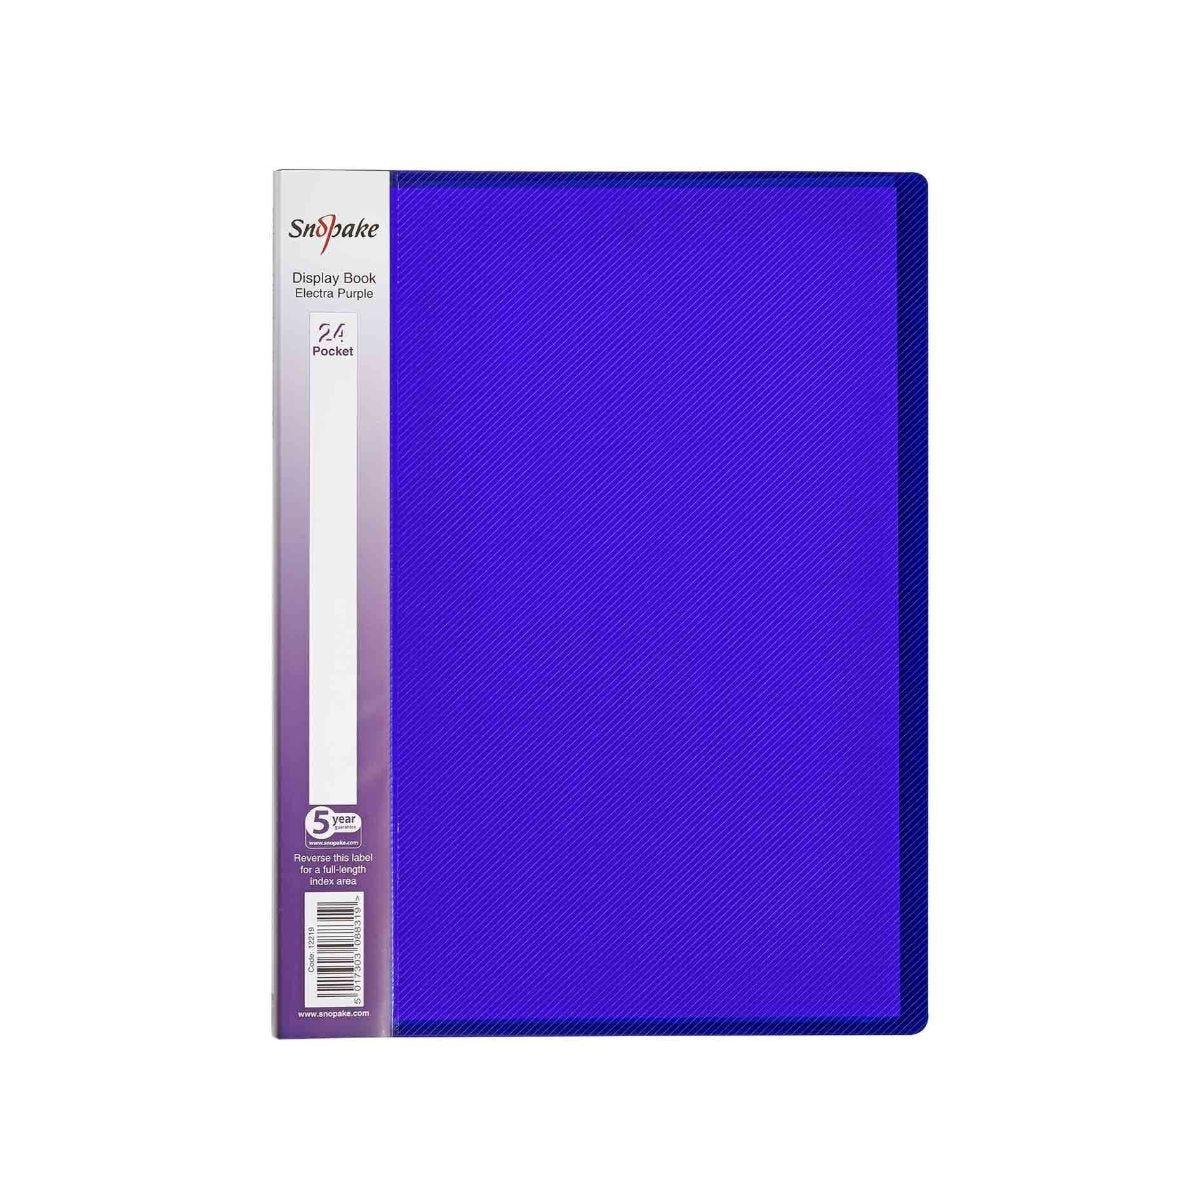 Snopake Polyfile Display Book A4 24 Pocket Pack of 5 Purple